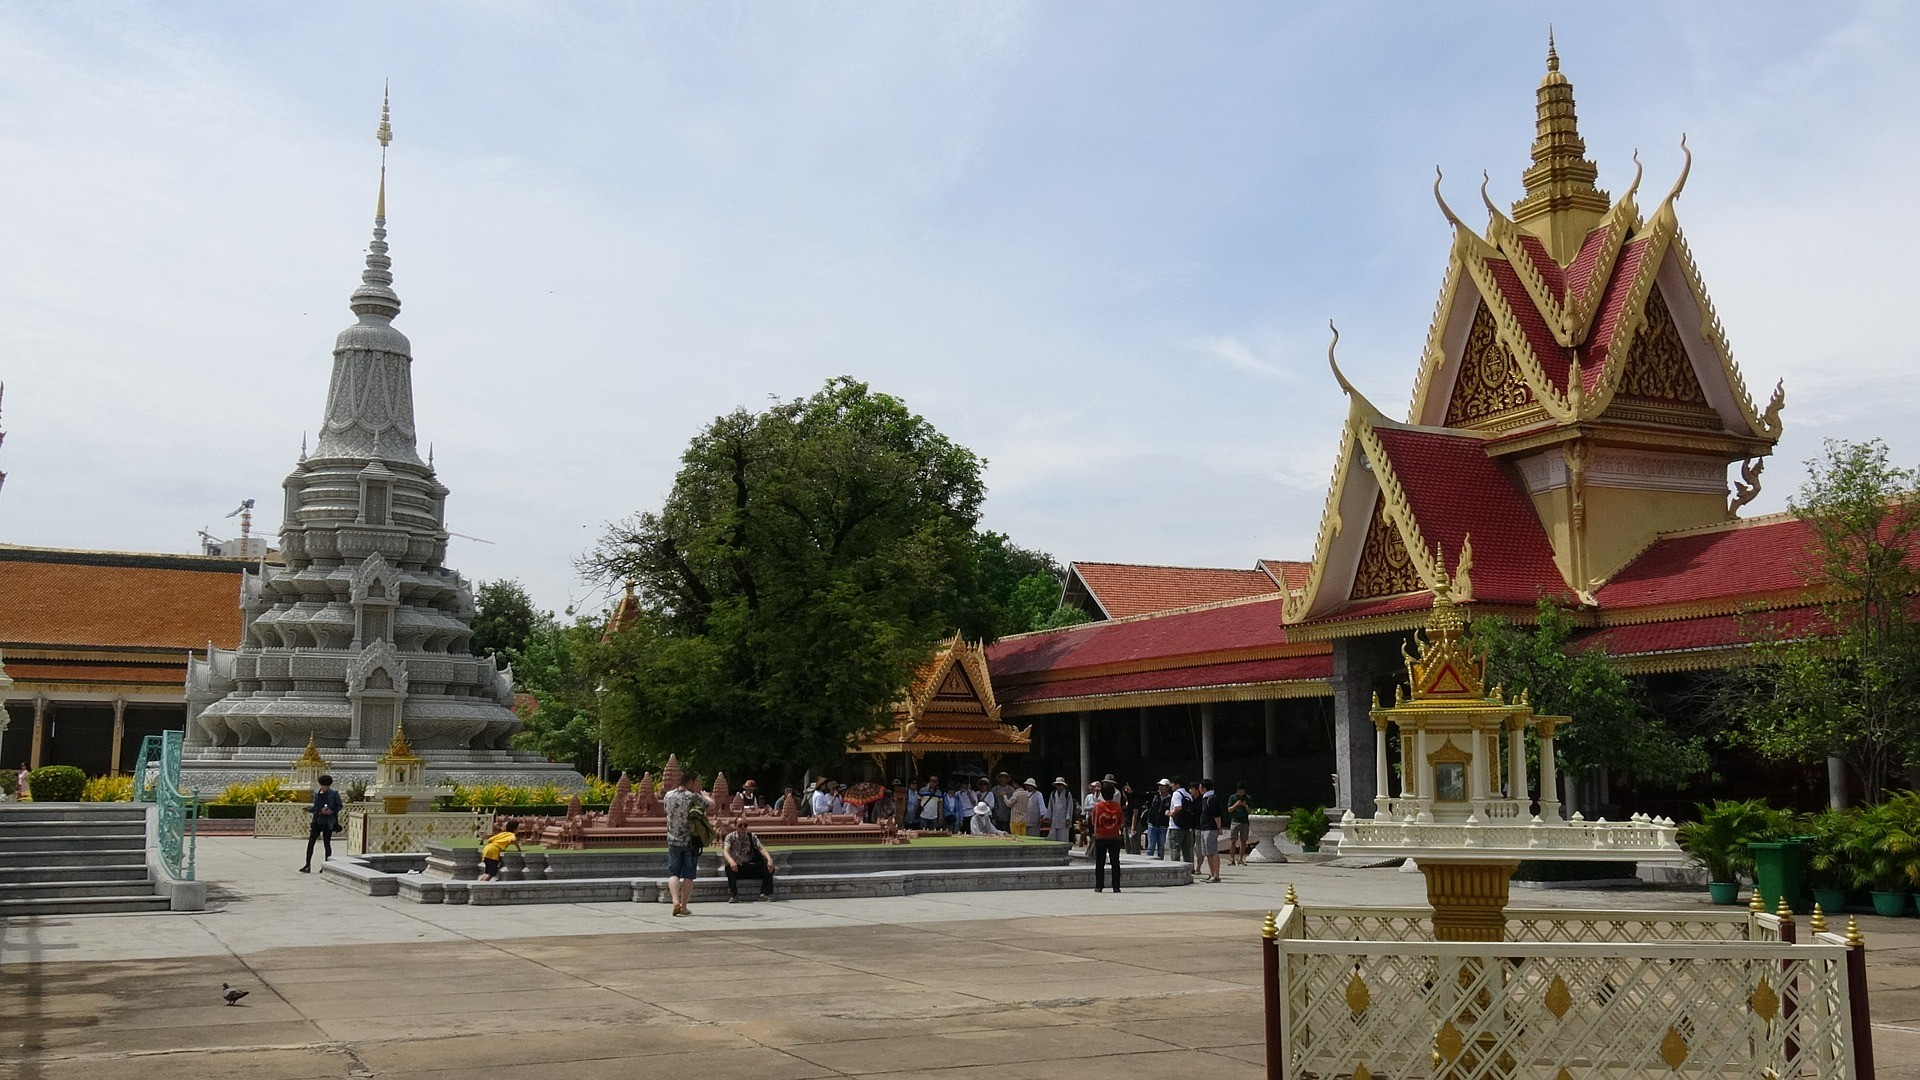 Vue de Phnom Penh, capitale du Cambodge